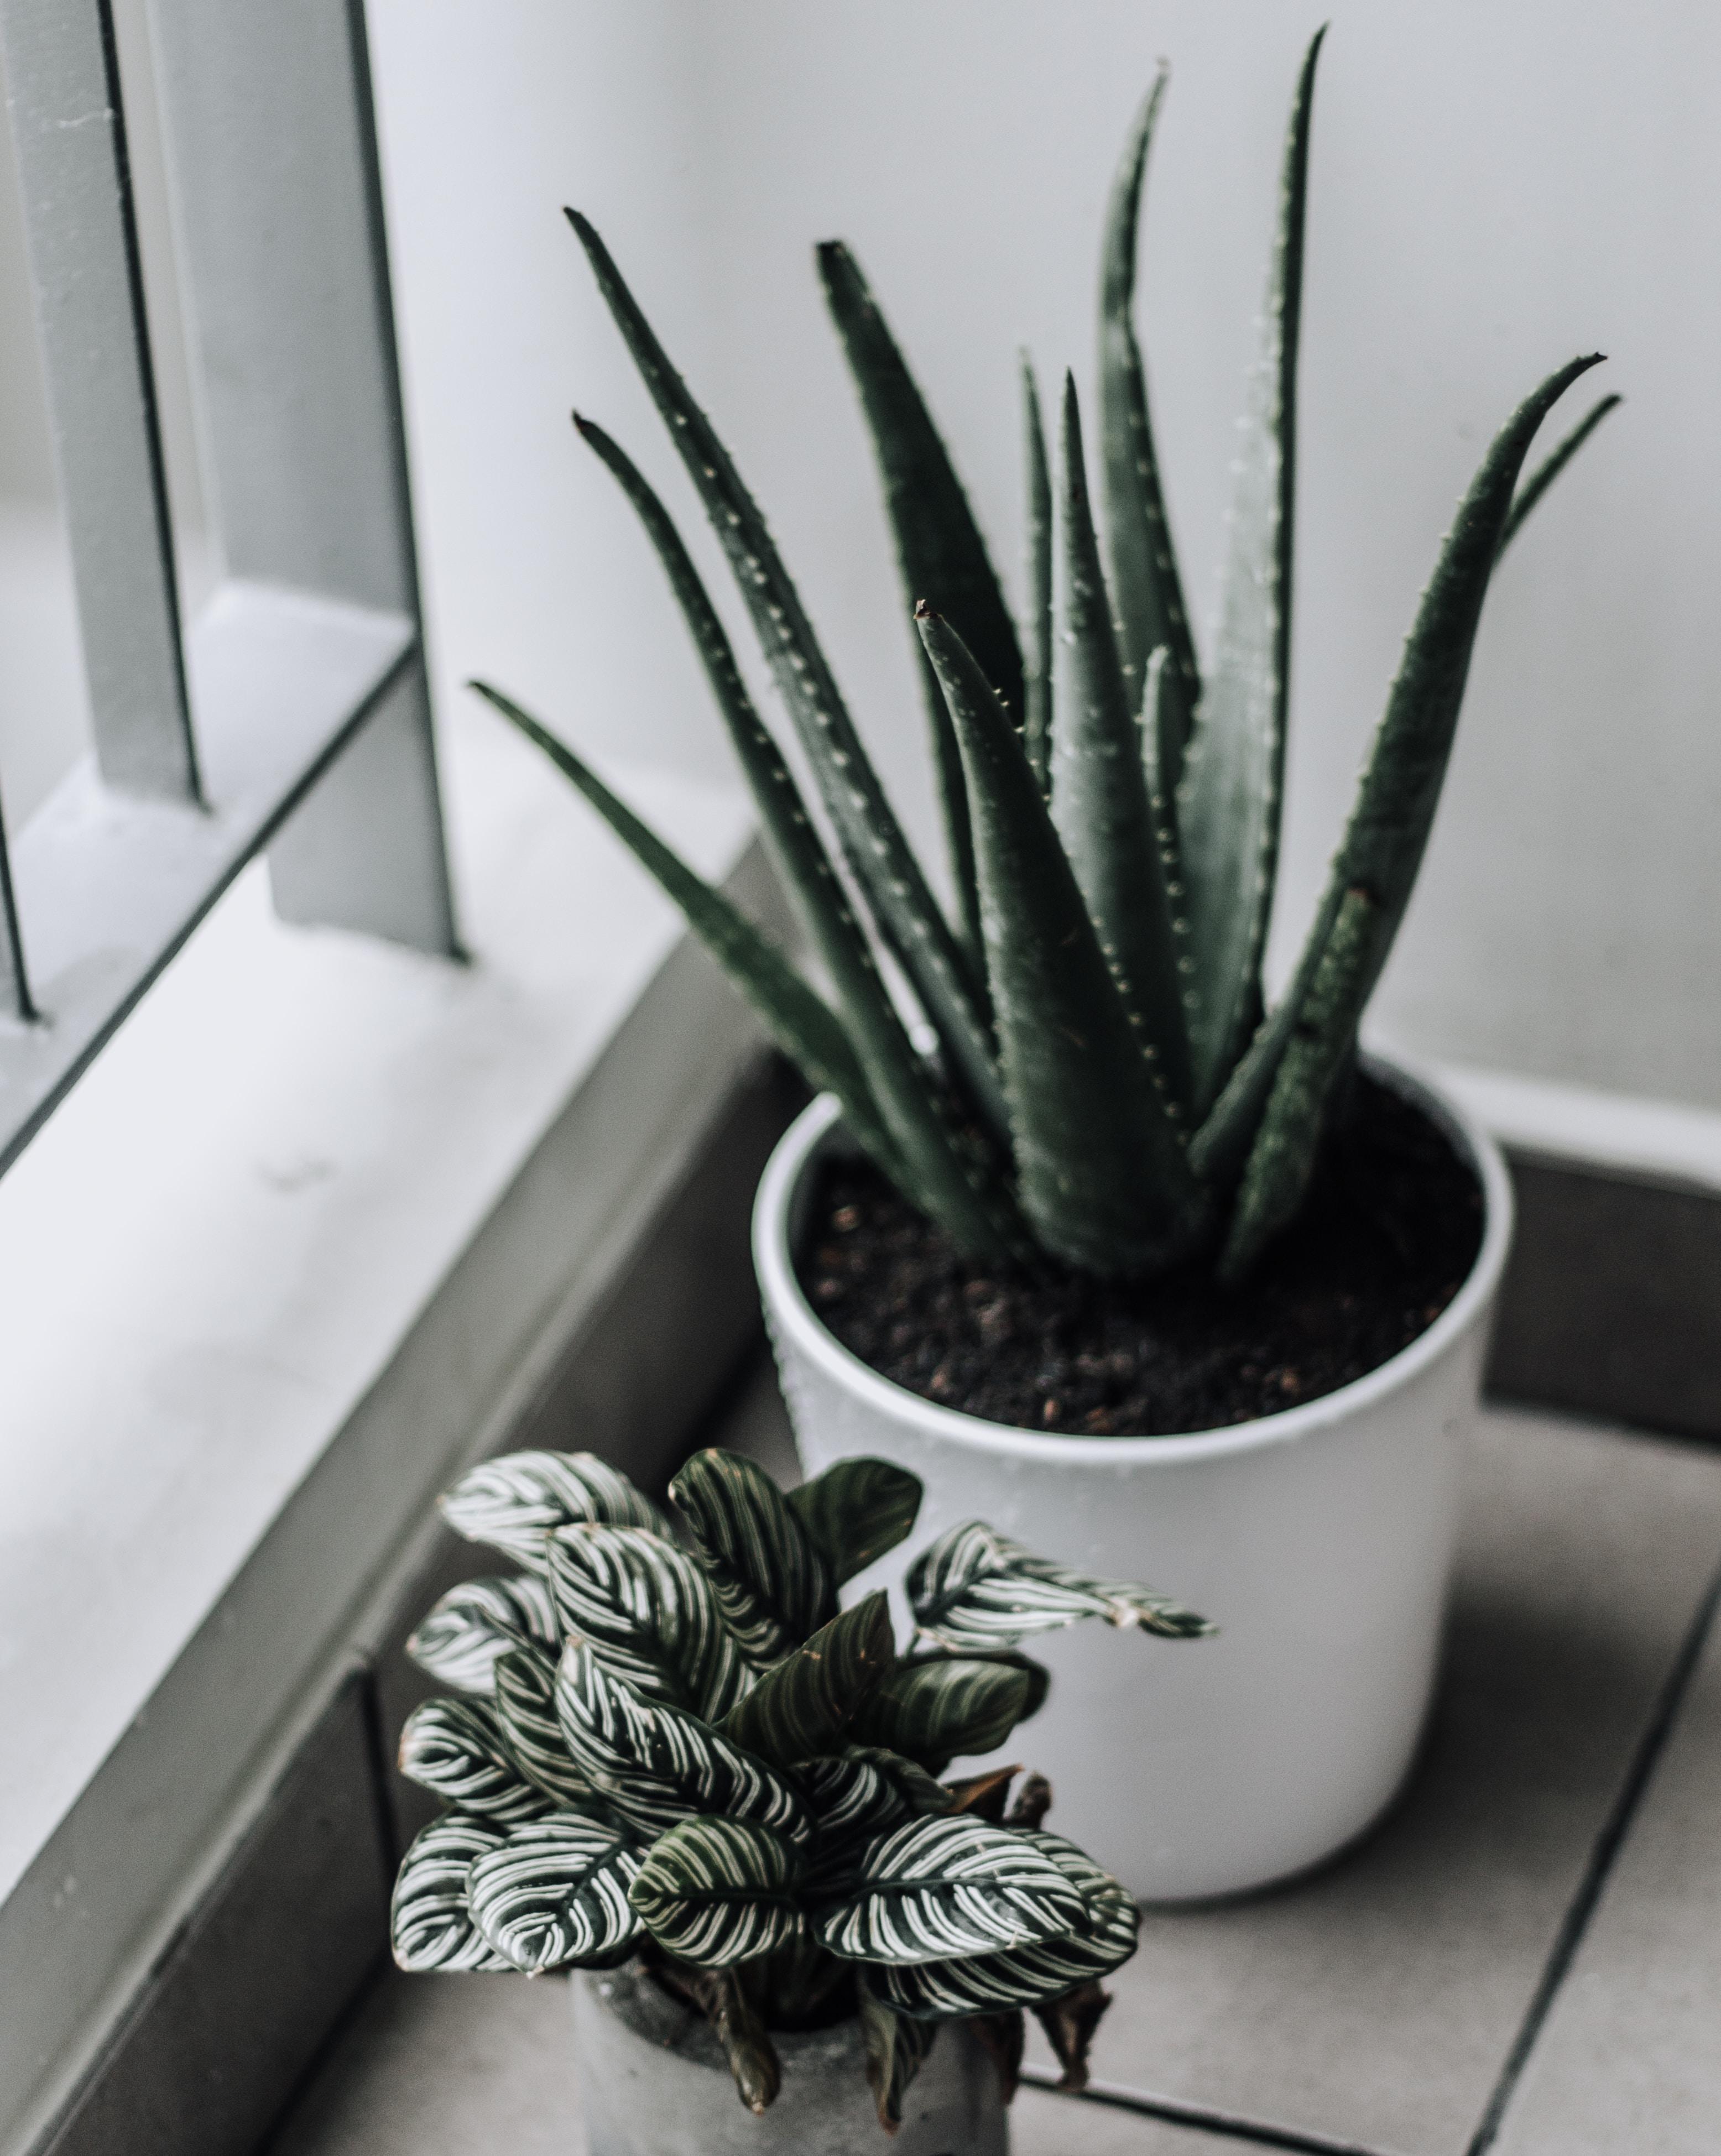 shallow focus photography of aloe vera plant in ceramic pot